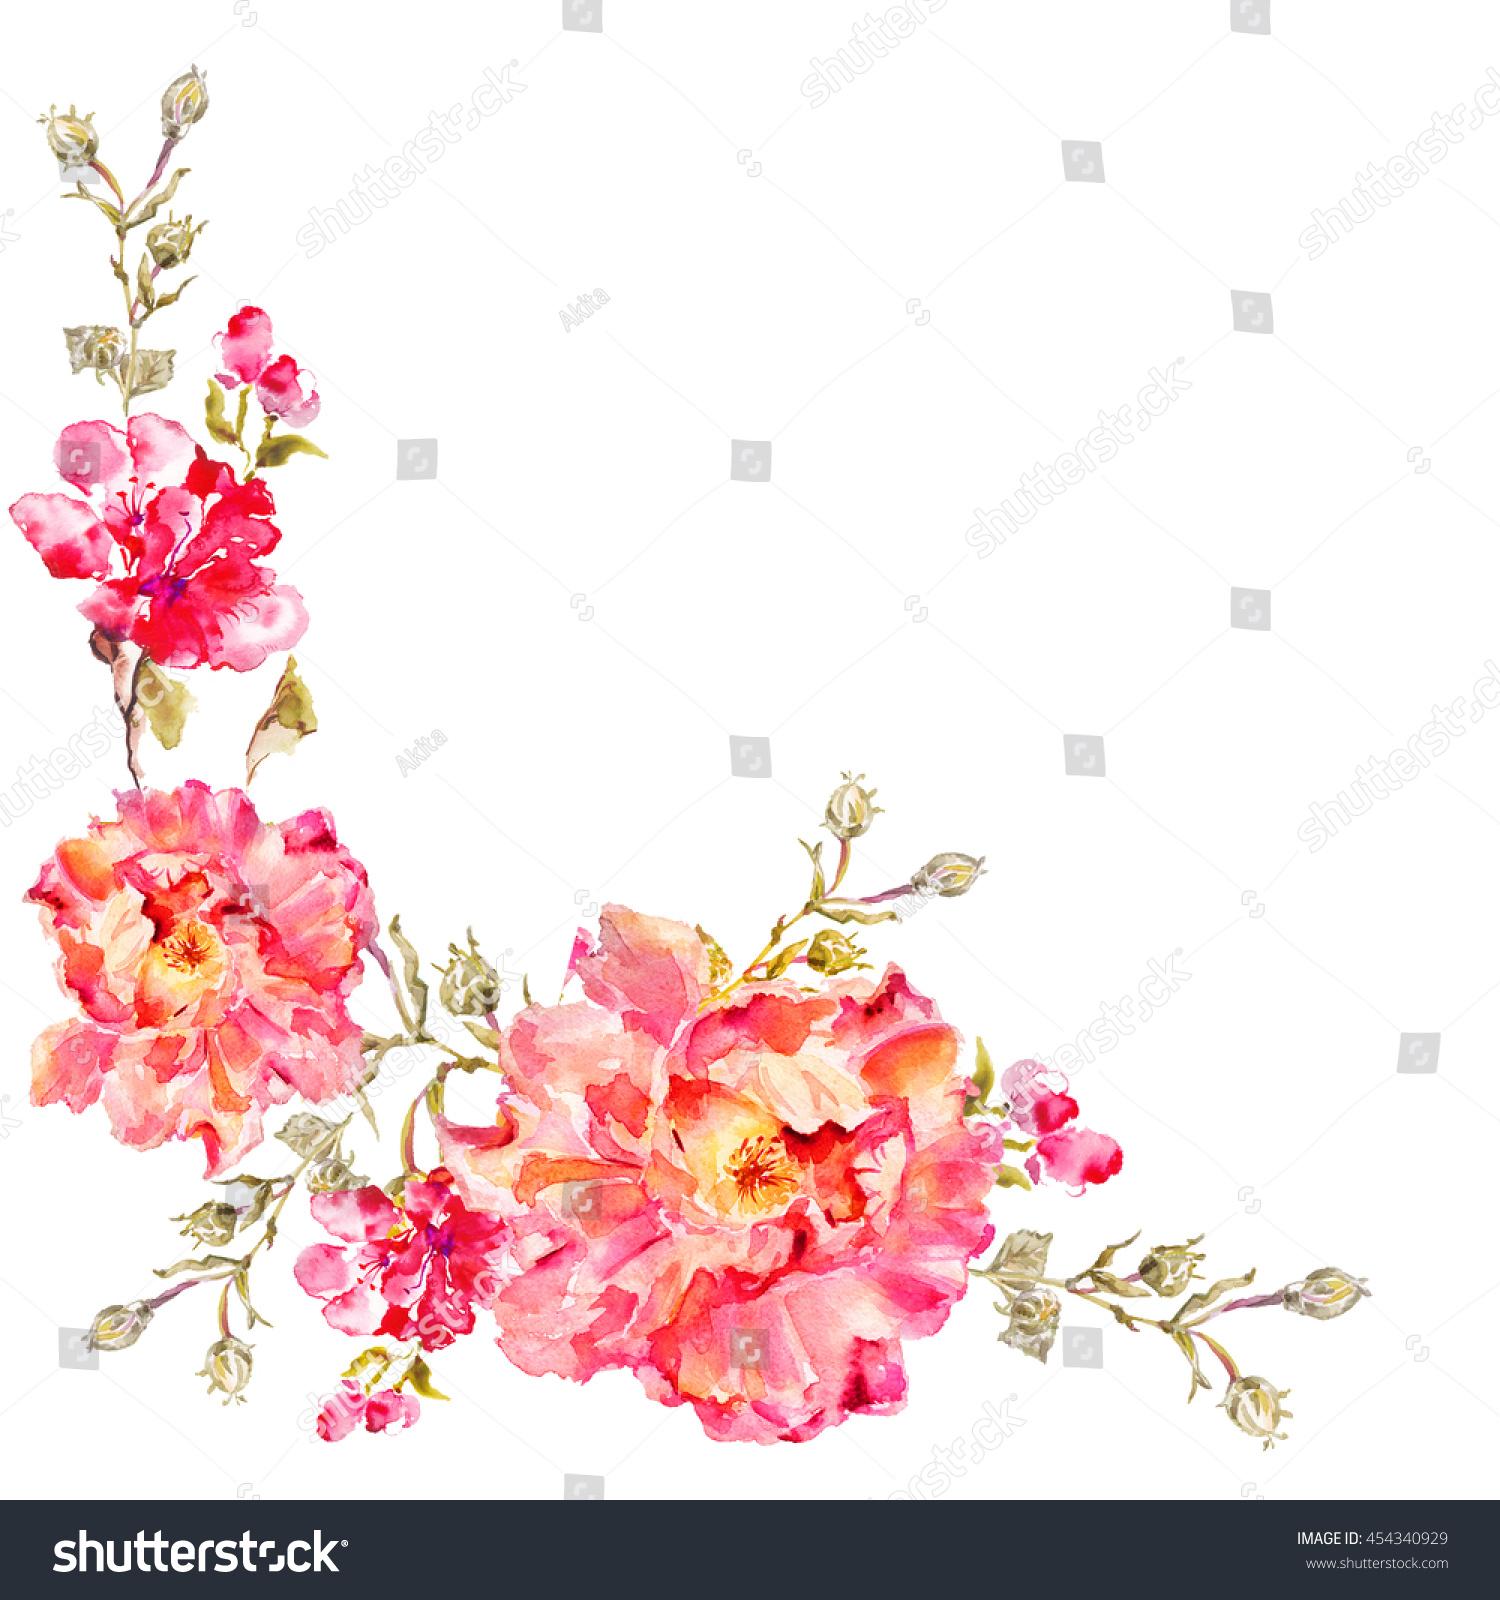 Flower Watercolor Background Floral Illustration Bouquet Stock